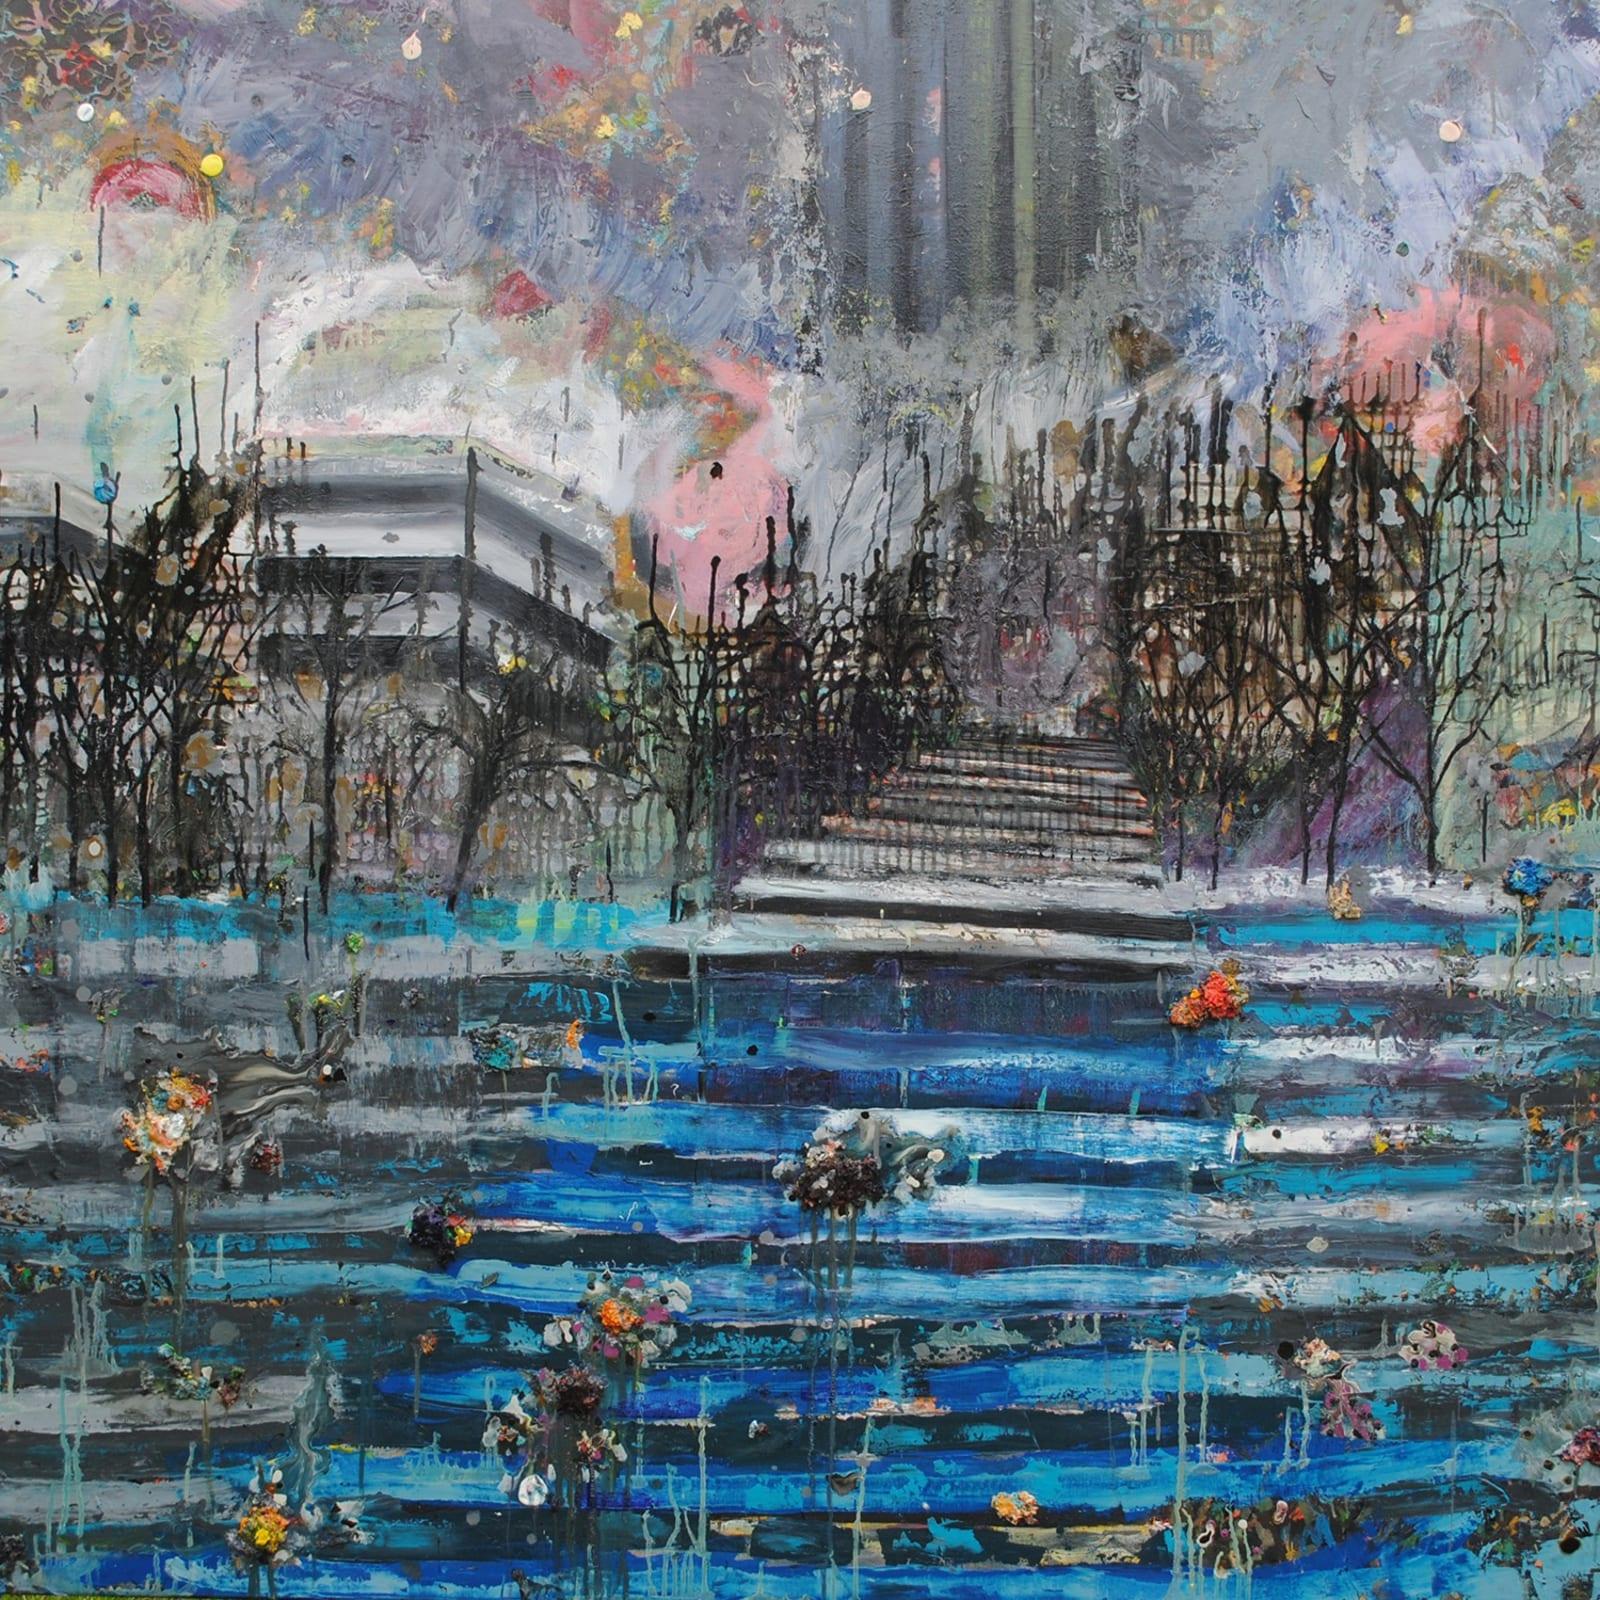 Thomas Brezing  Leaving Nineveh  Oil on canvas  200 x 200cm